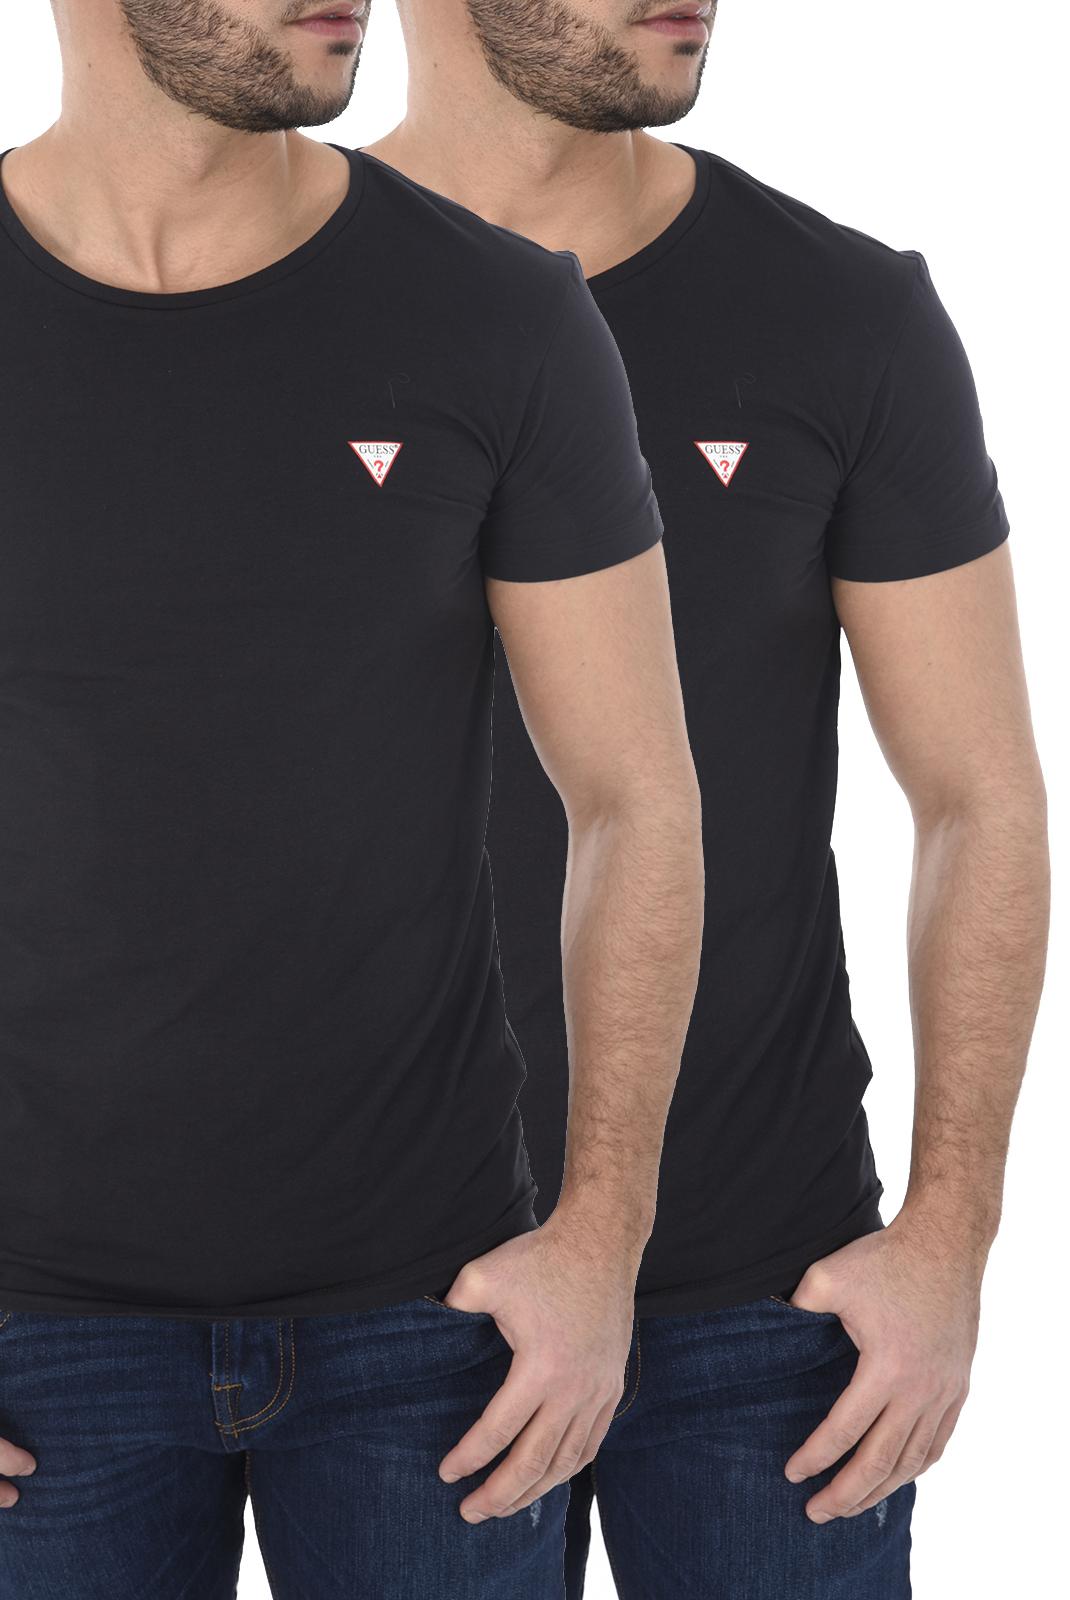 Tee-shirts manches courtes  Guess jeans U77G13 JR003 A996 BLACK